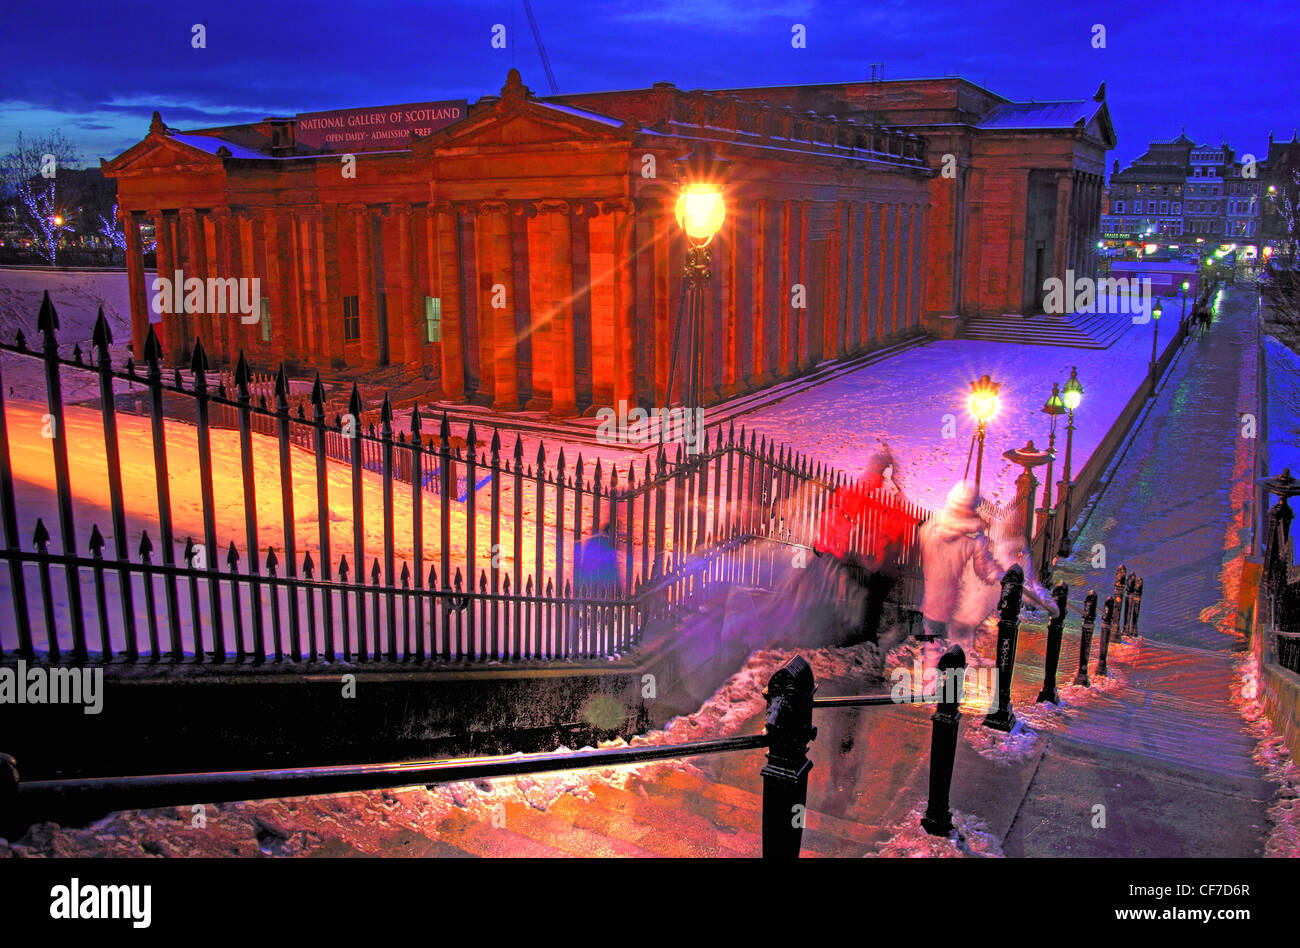 Playfair steps at night,Edinburgh,City,Centre,Lothians,Scotland,UK,GB,Great,Britain,winter,snow,ice,icy,cold,winter,Playfair,Steps,between,the,Mound,and,Princes,Street,gotonysmith,evening,light,Museum,of,Scotland,Gallery,blue,hour,Ecose,Ecosse,Dùn,Èideann,Dun,Eideann,LEcosse,Edimbourg,Schotland,Schottland,La,Scozia,Edimburgo,Escocia,Edimburgo,scottish,independance,independence,home,rule,devolution,parliament,SNP,national,party,@Hotpixuk,gotonysmith,Edinburg,dusk,art,Tour,tourist,tourism,tourist,attraction,Buy Pictures of,Buy Images Of,national gallery,edinburgh national,edinburgh national galleries,Tourist Attraction